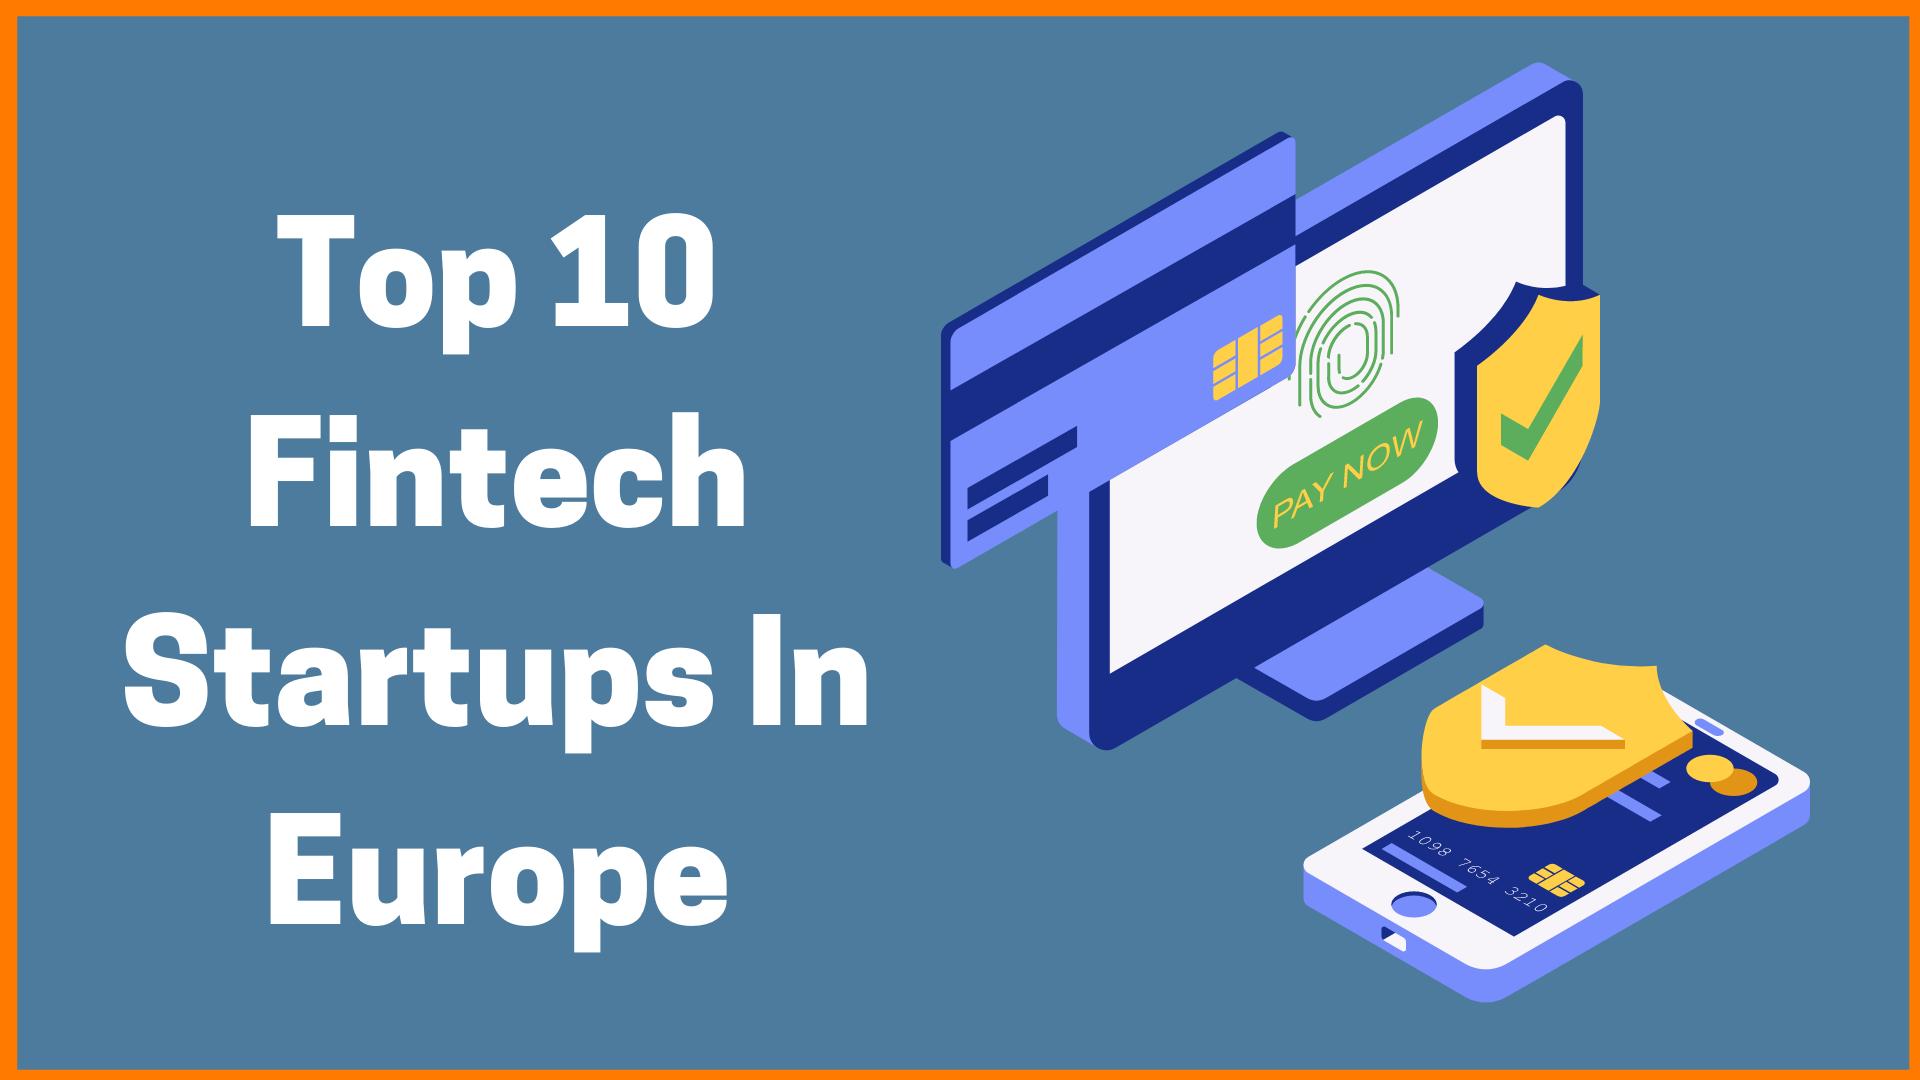 Top 10 Fintech Startups In Europe